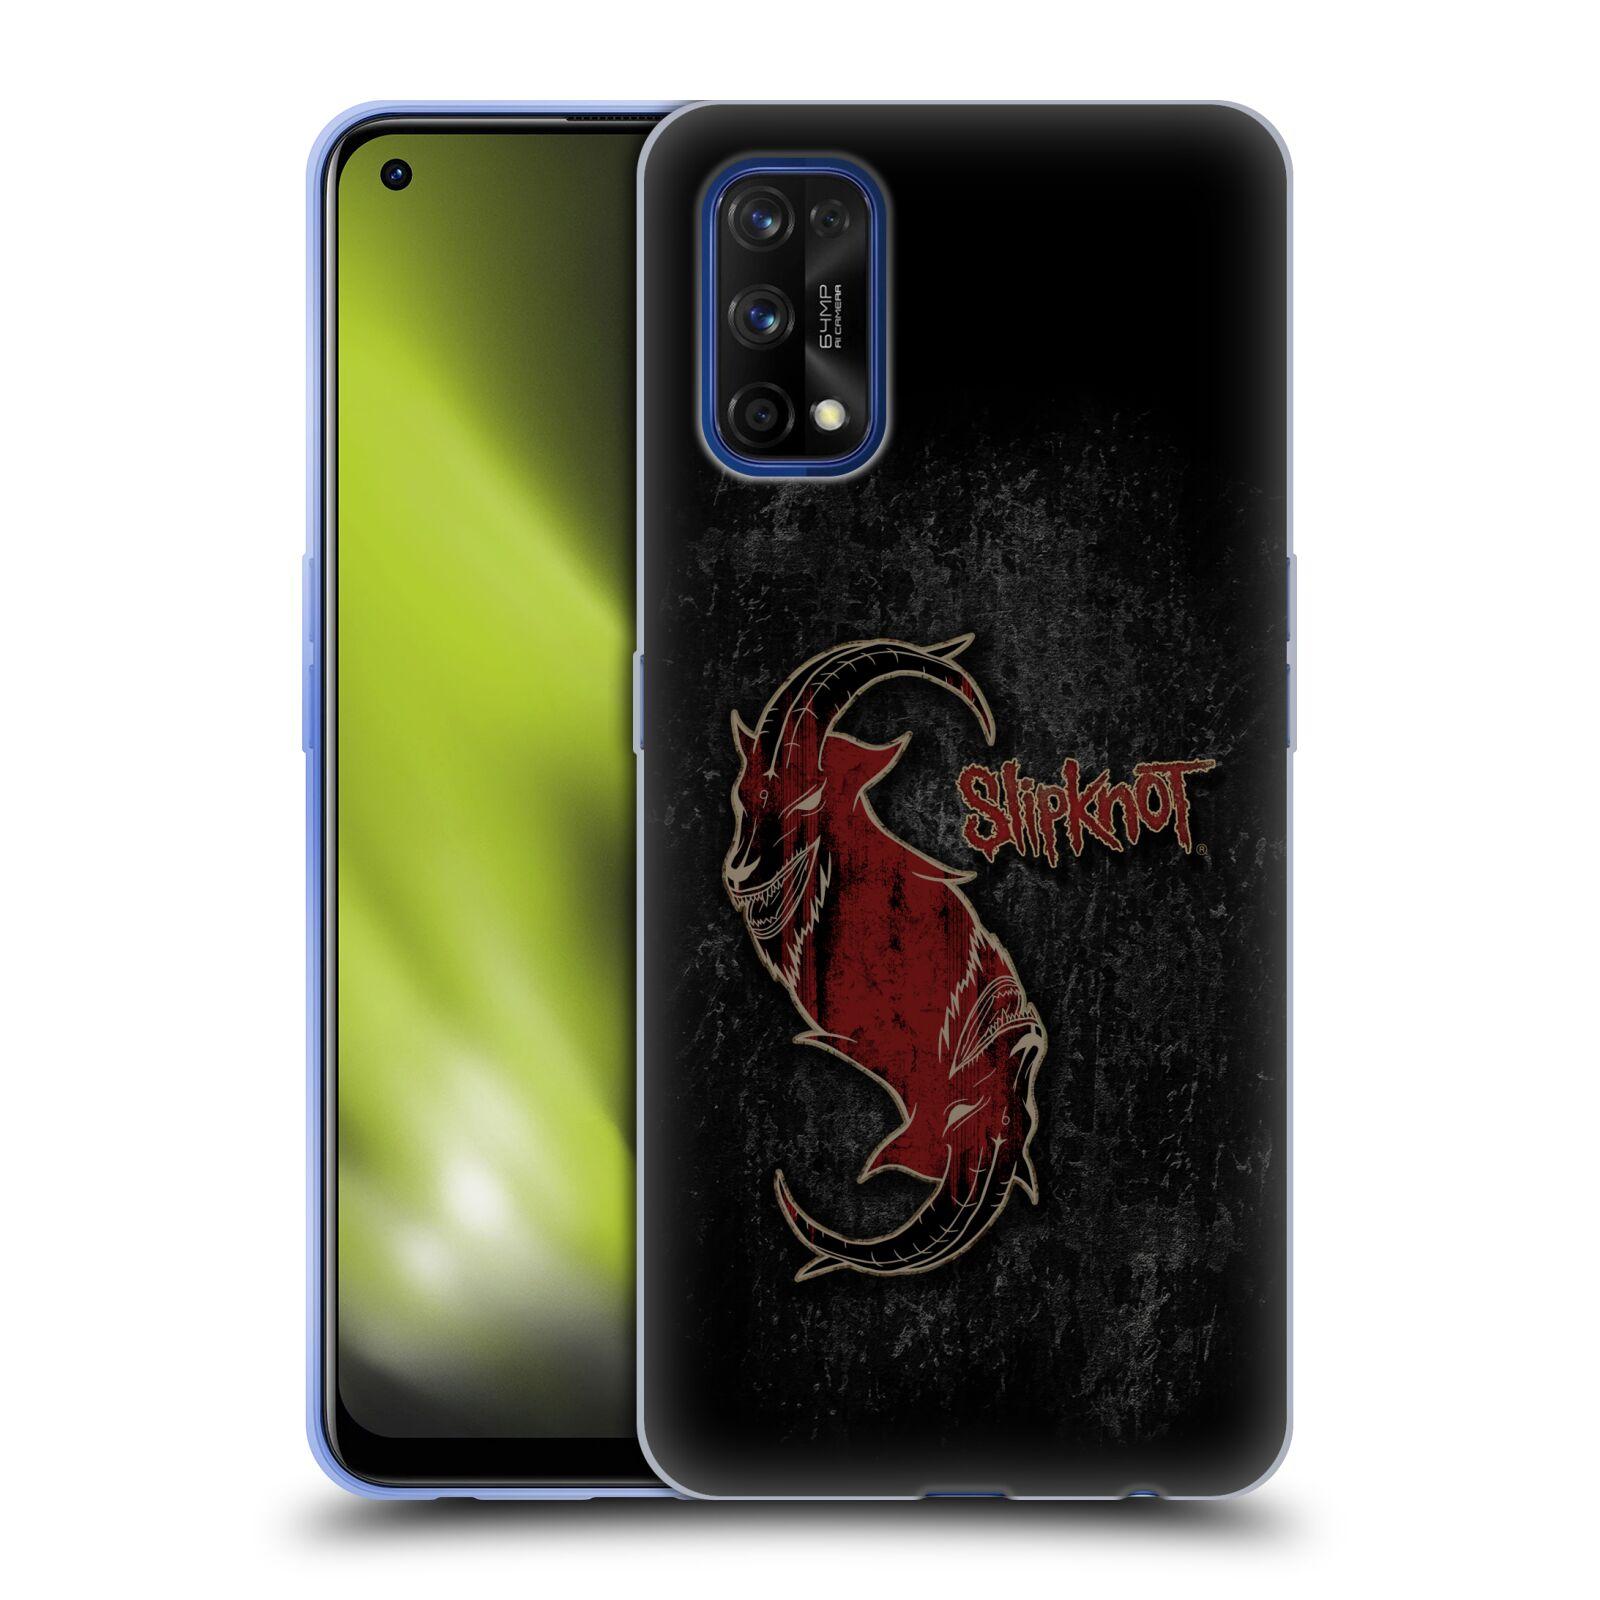 Silikonové pouzdro na mobil Realme 7 Pro - Head Case - Slipknot - Rudý kozel